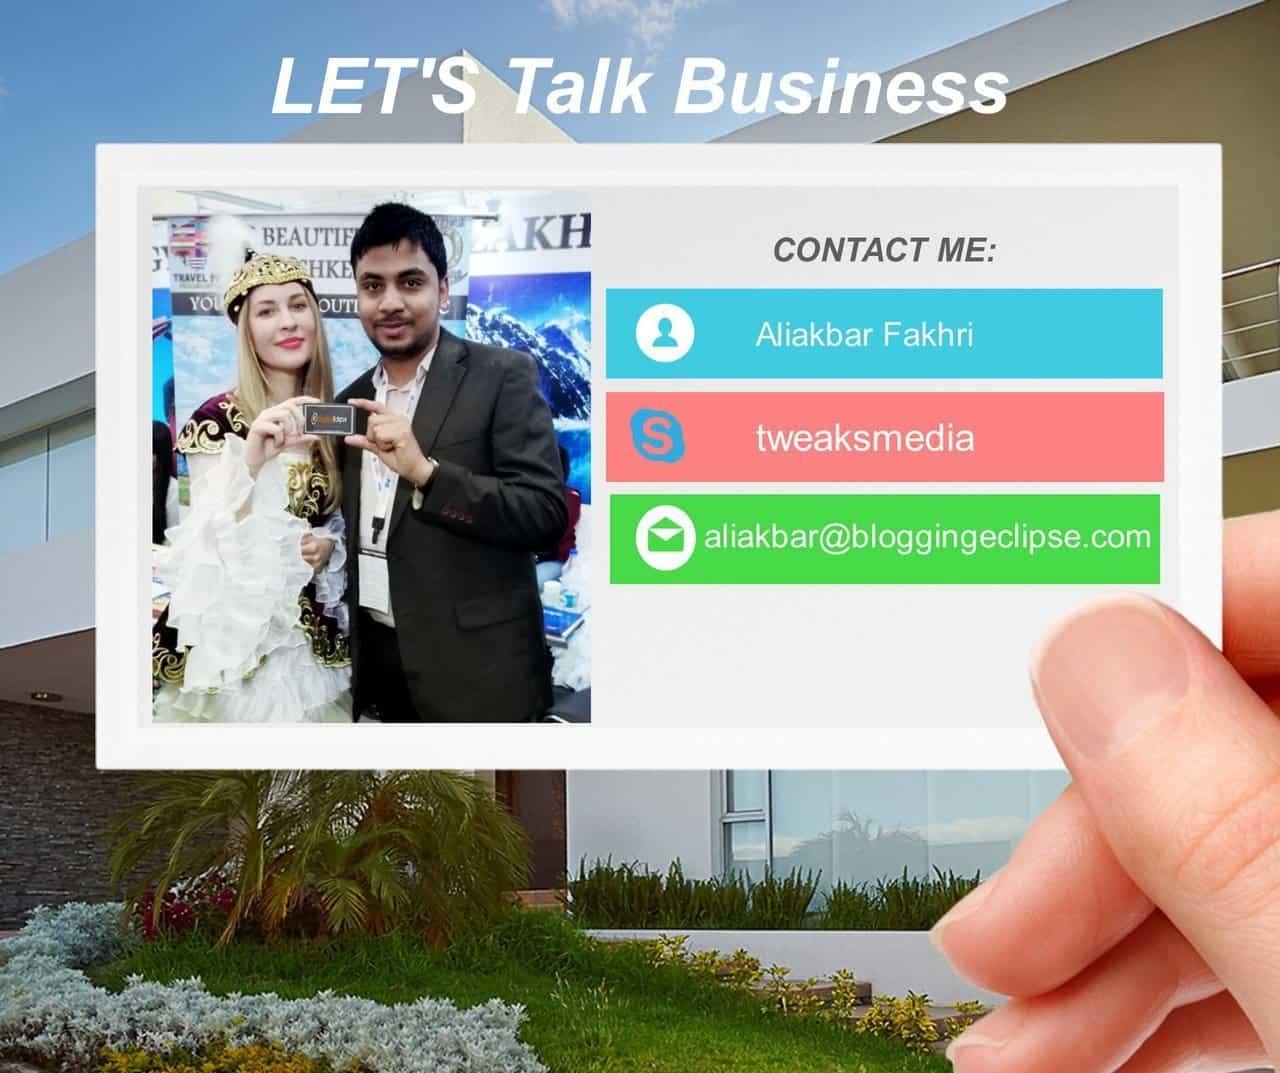 Contact Aliakbar Fakhri